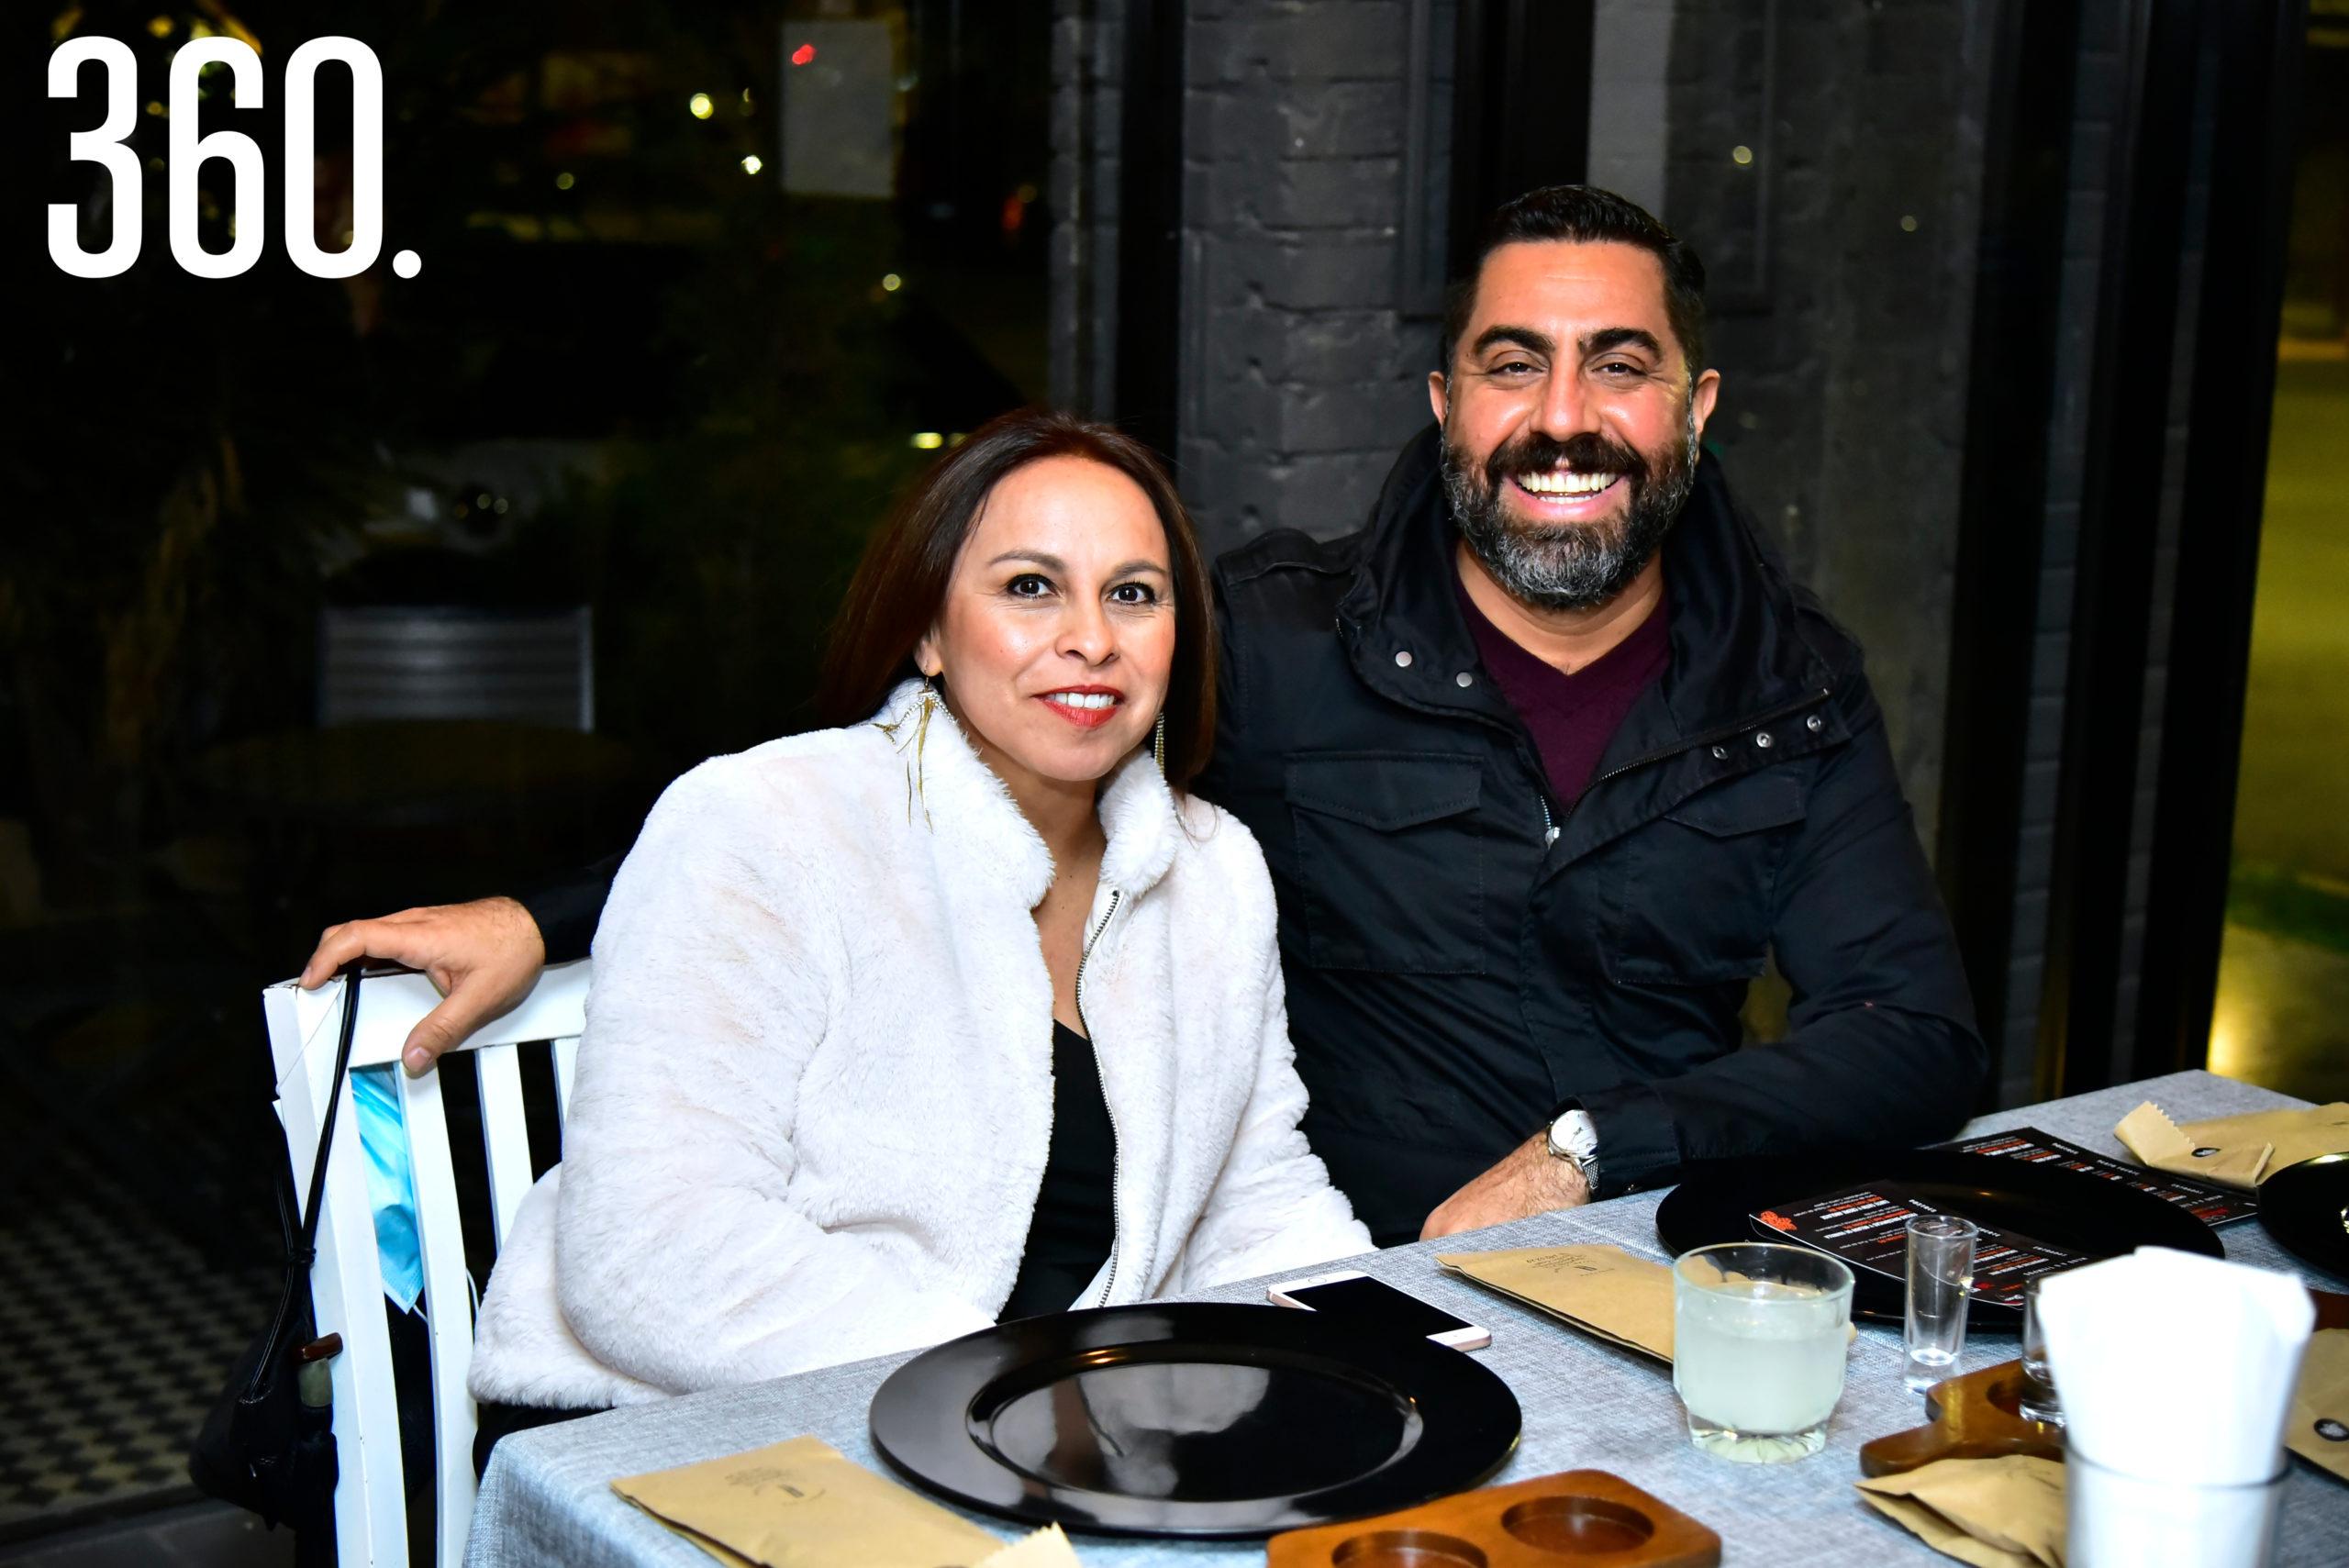 Aída Meza y Erick Hurtado.